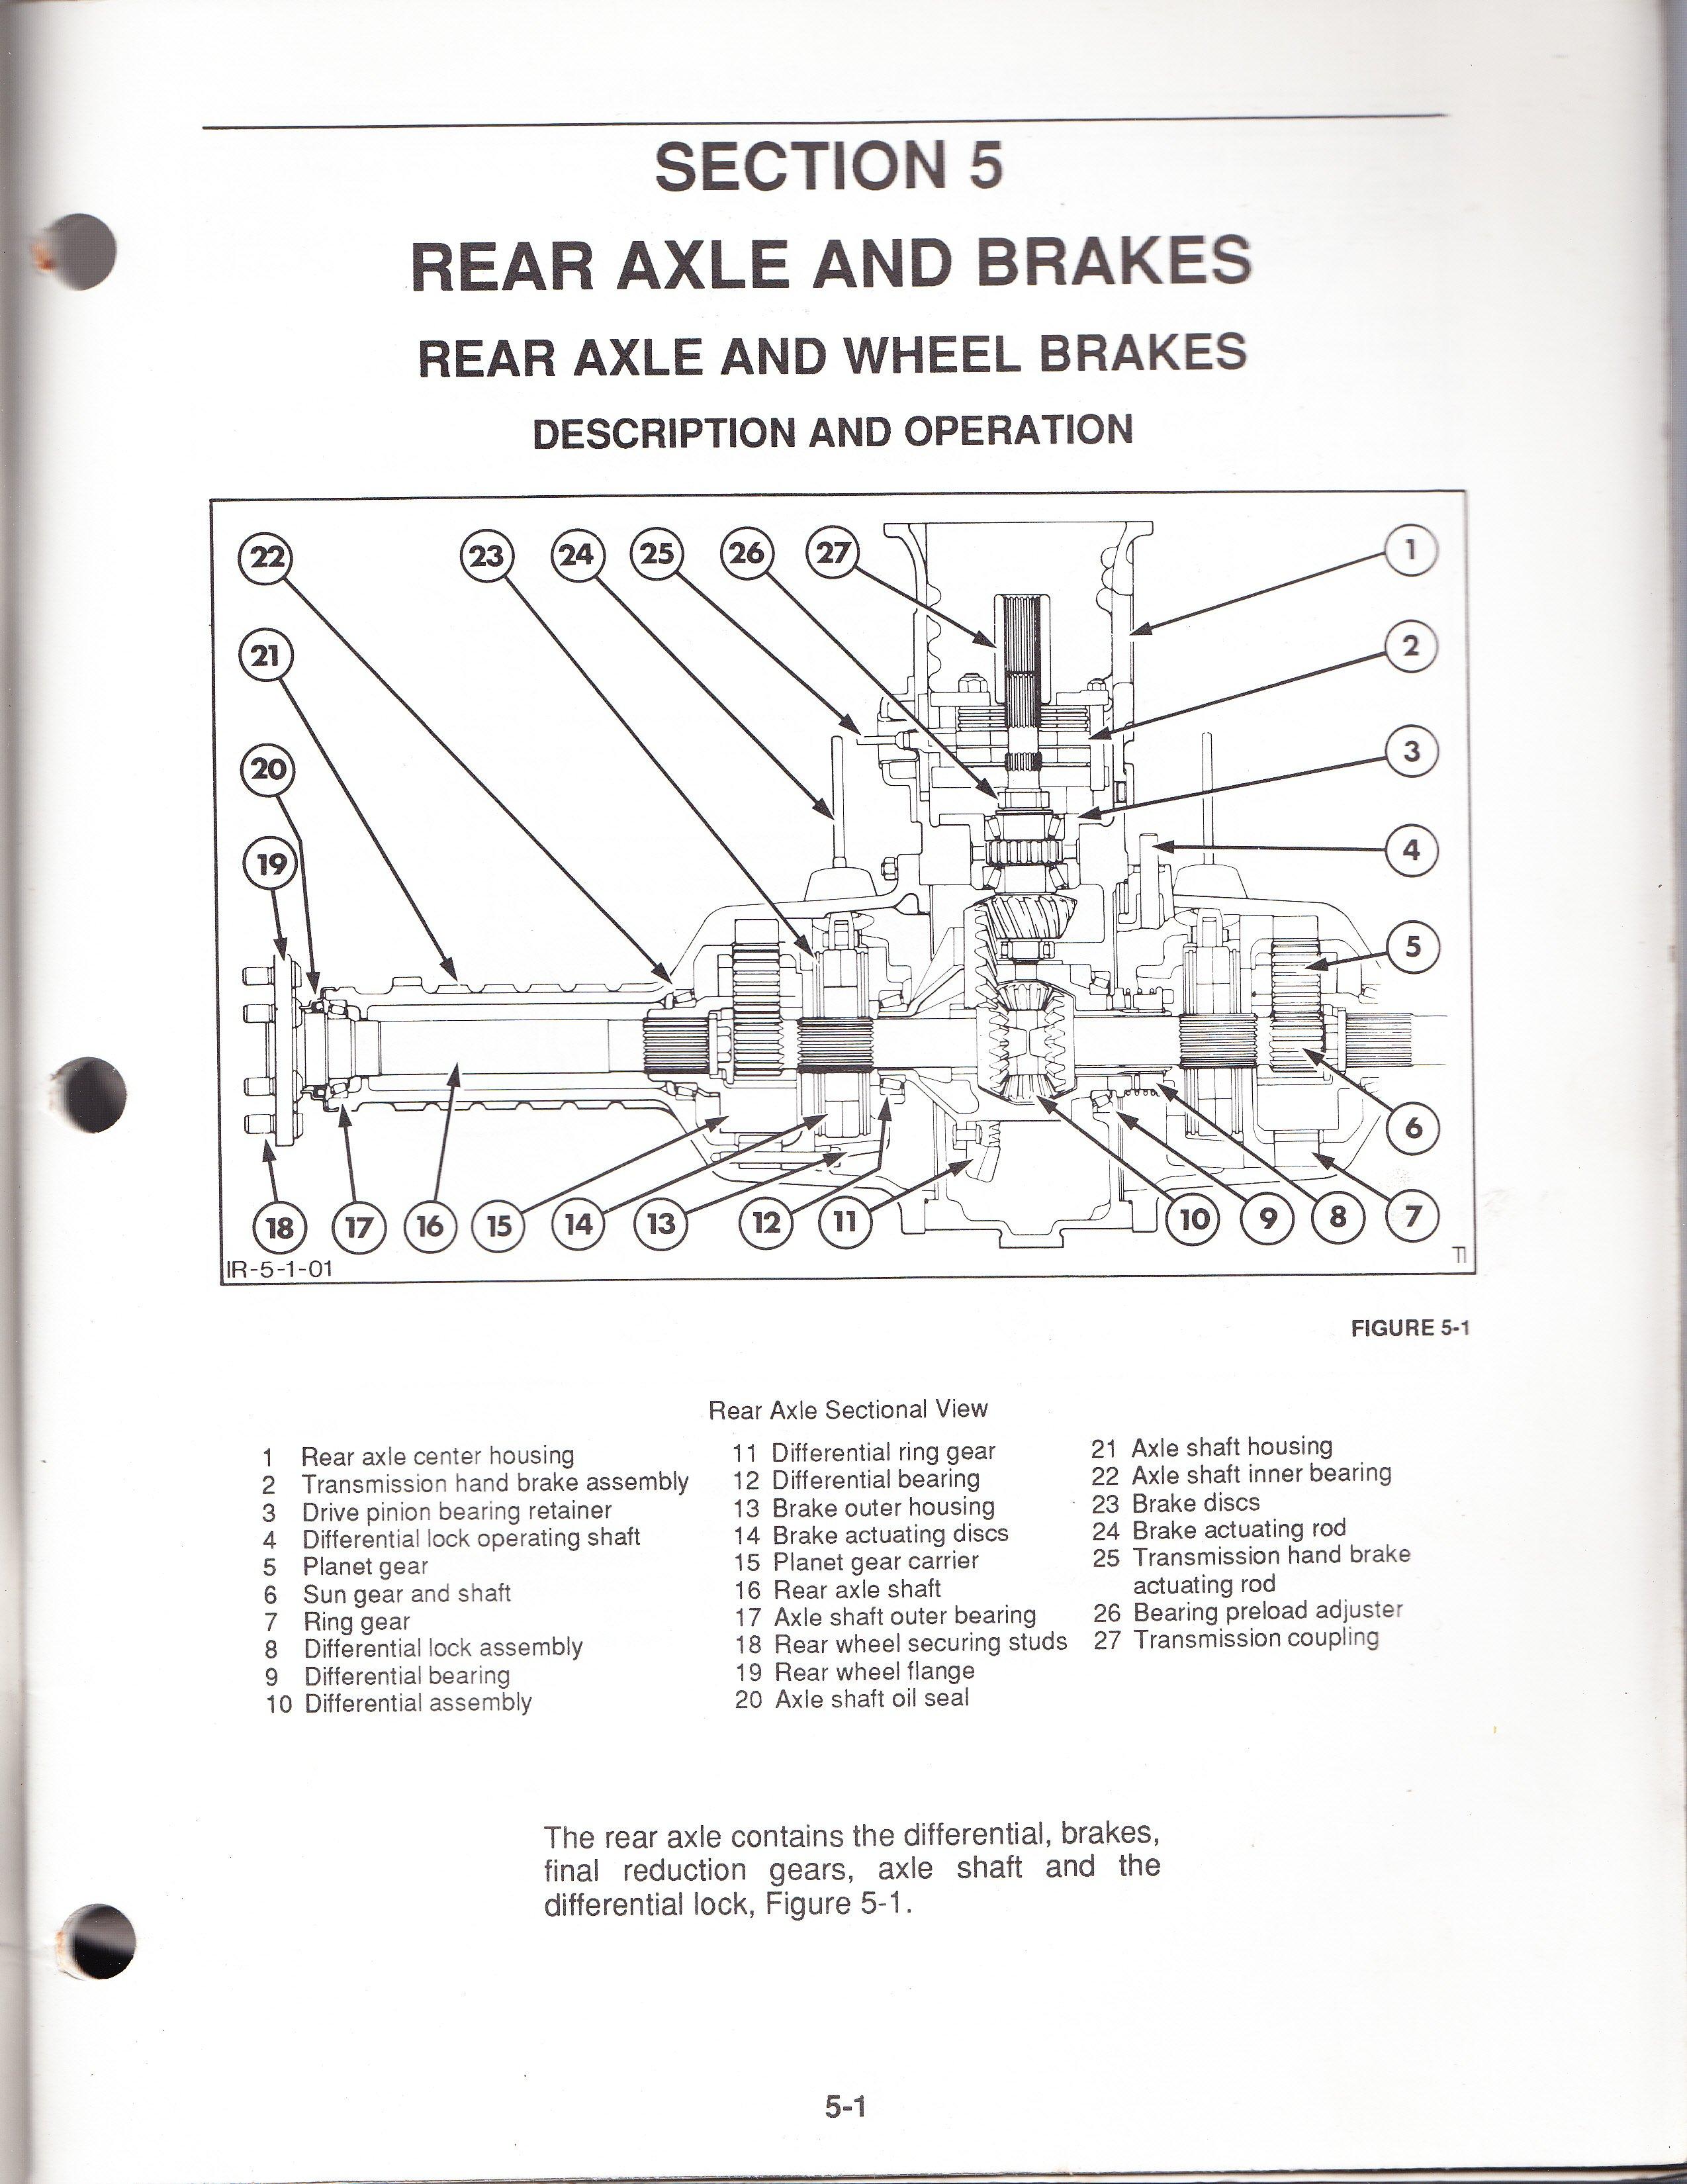 55 ford wiring diagram 1959 ford wiring diagram wiring